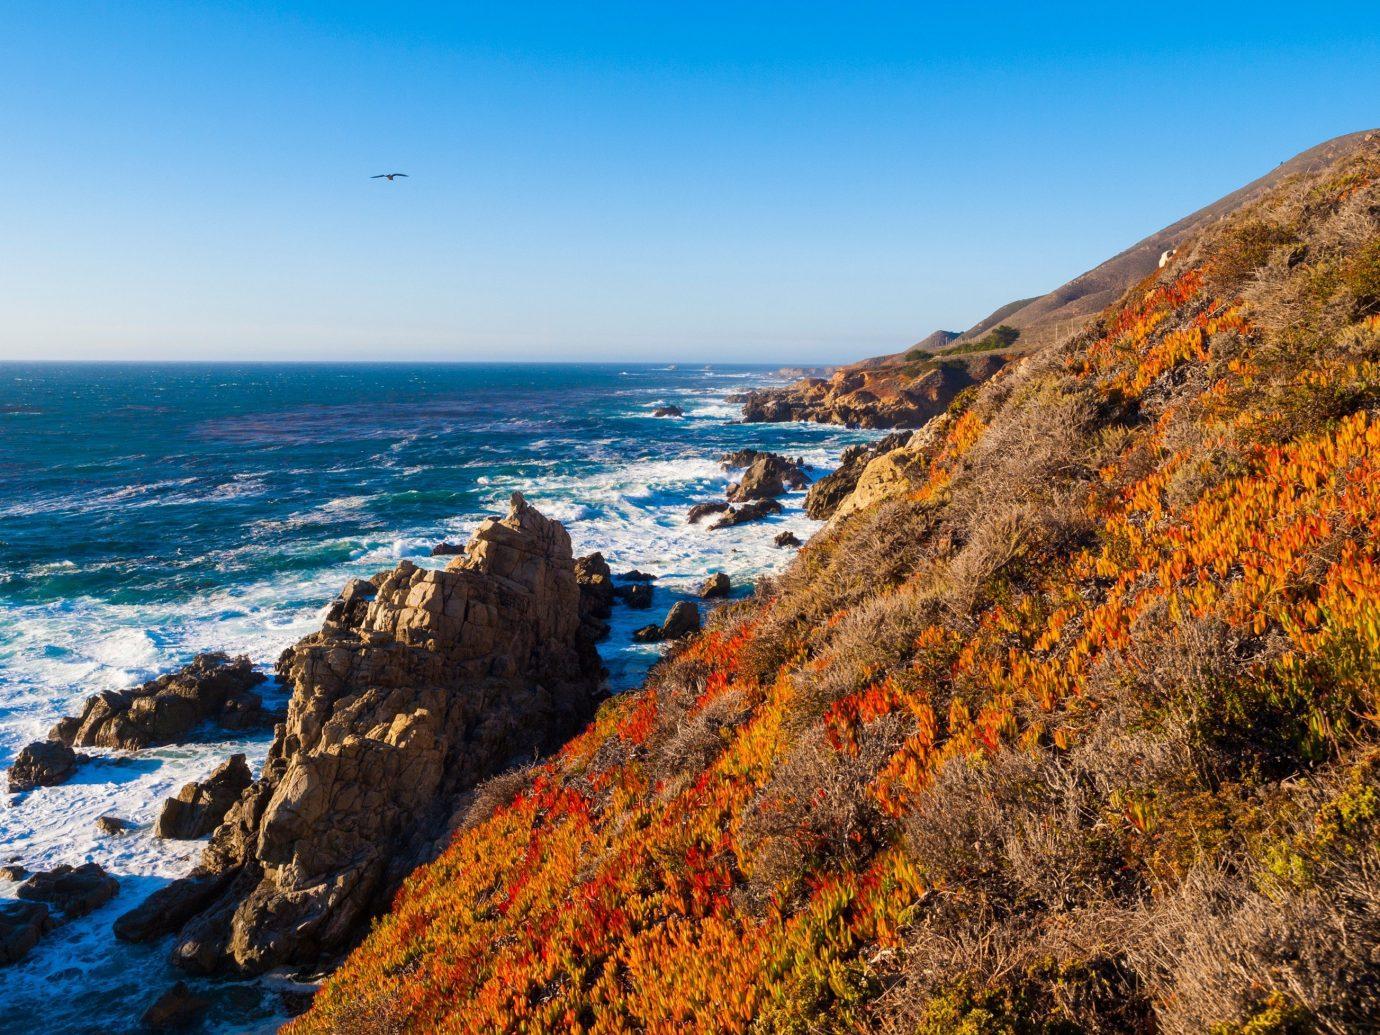 View of the ocean in Big Sur in California